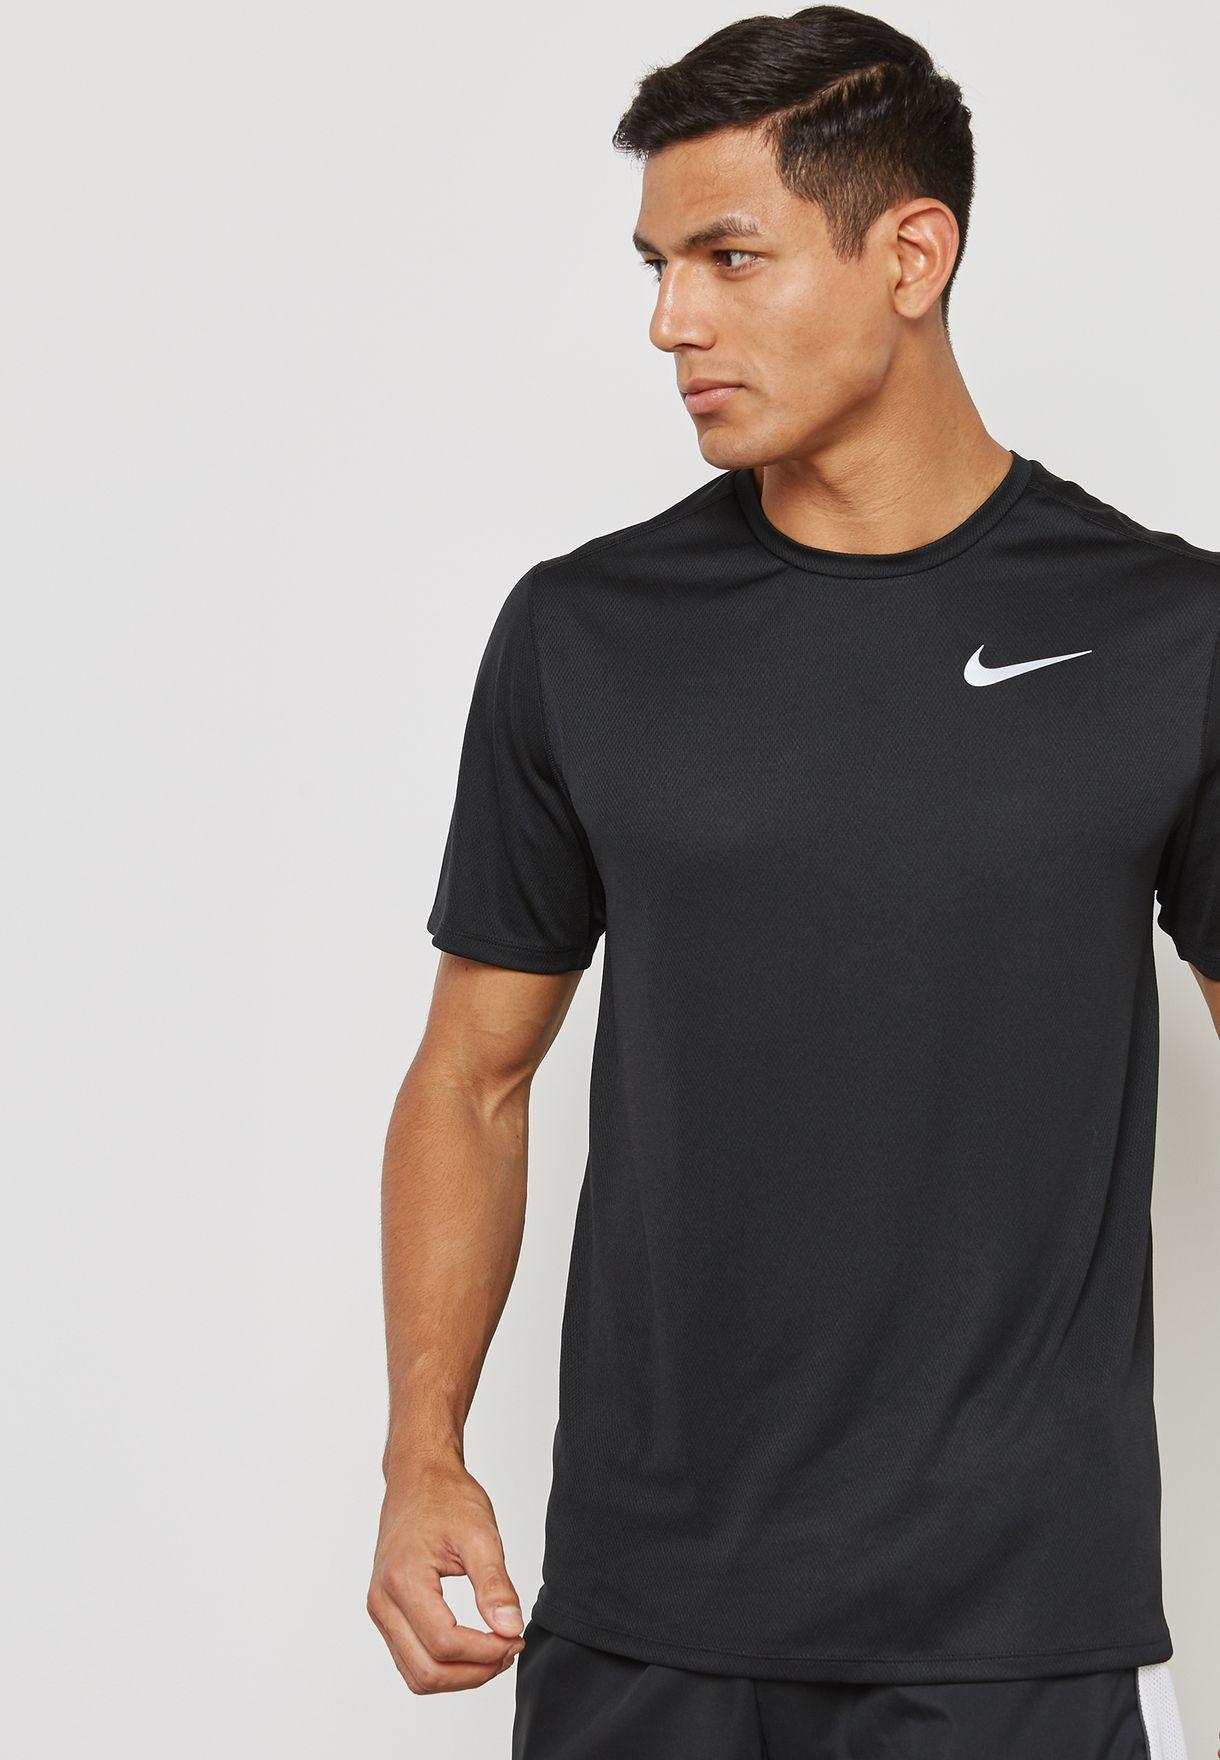 fae4f2e9 Shop Nike black Breathe Run T-Shirt 904634-010 for Men in UAE ...